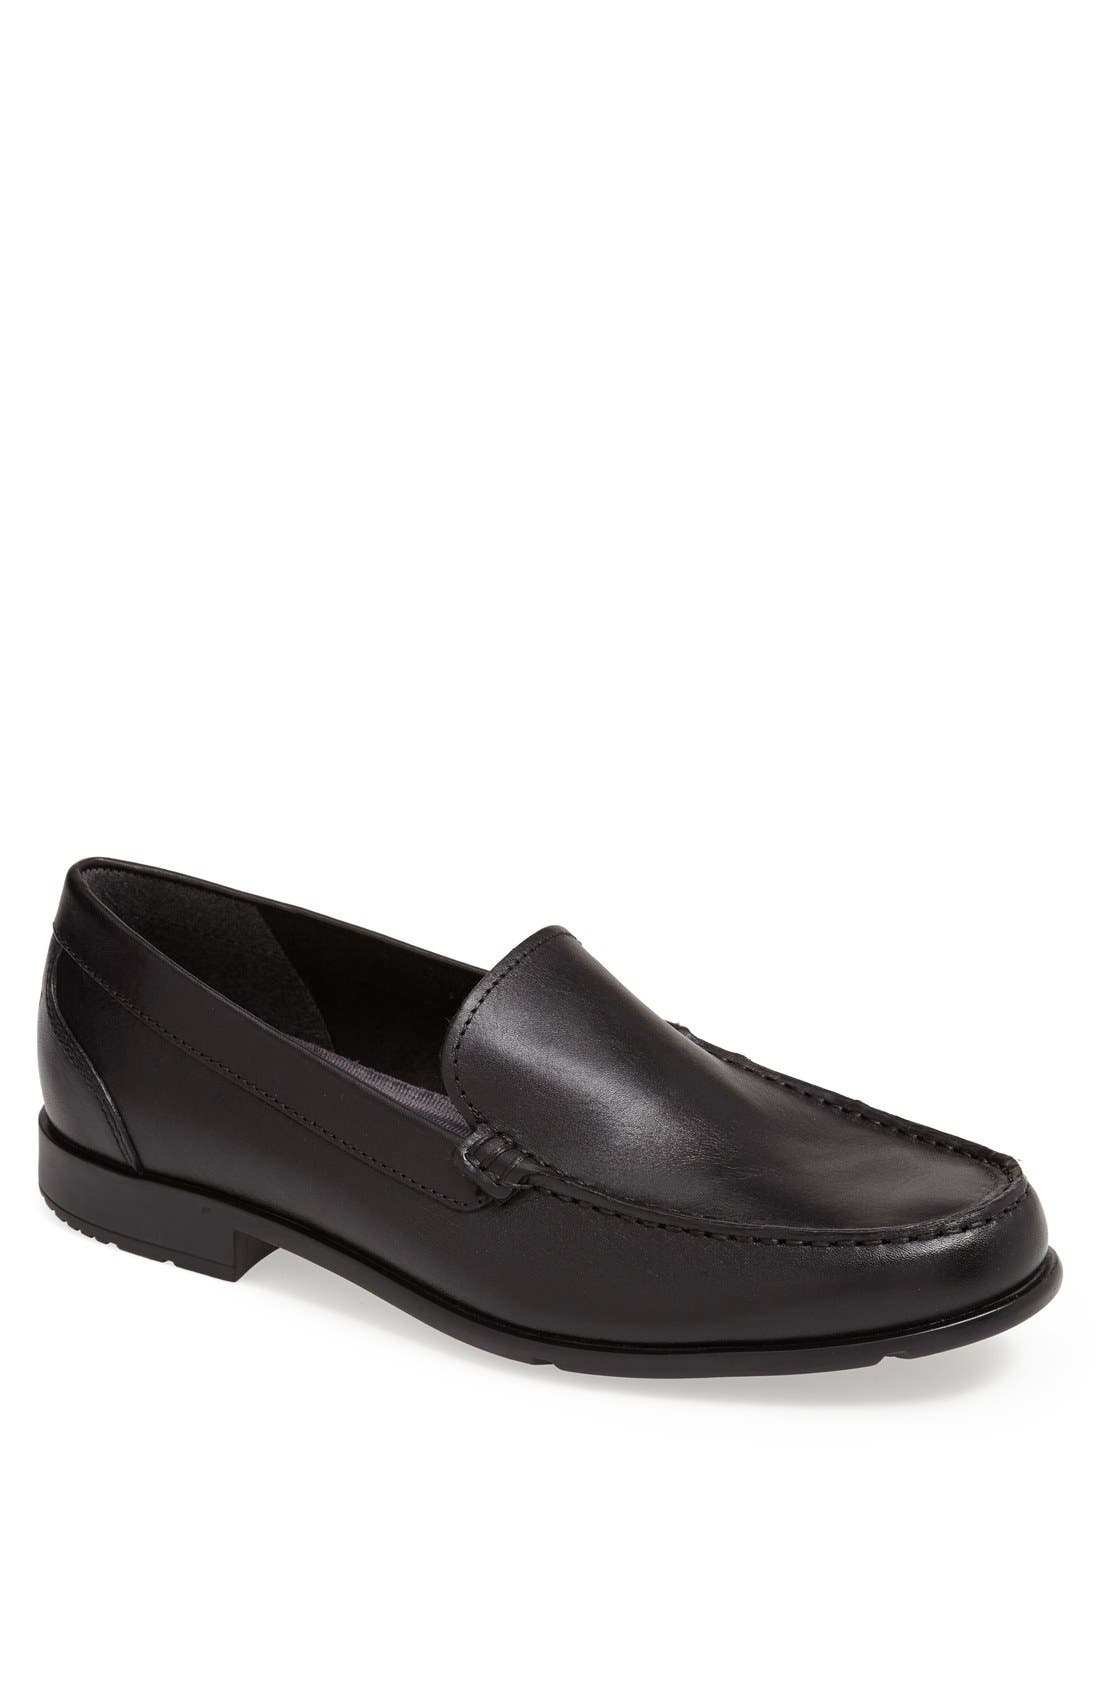 Main Image - Rockport Classic Venetian Loafer (Men)